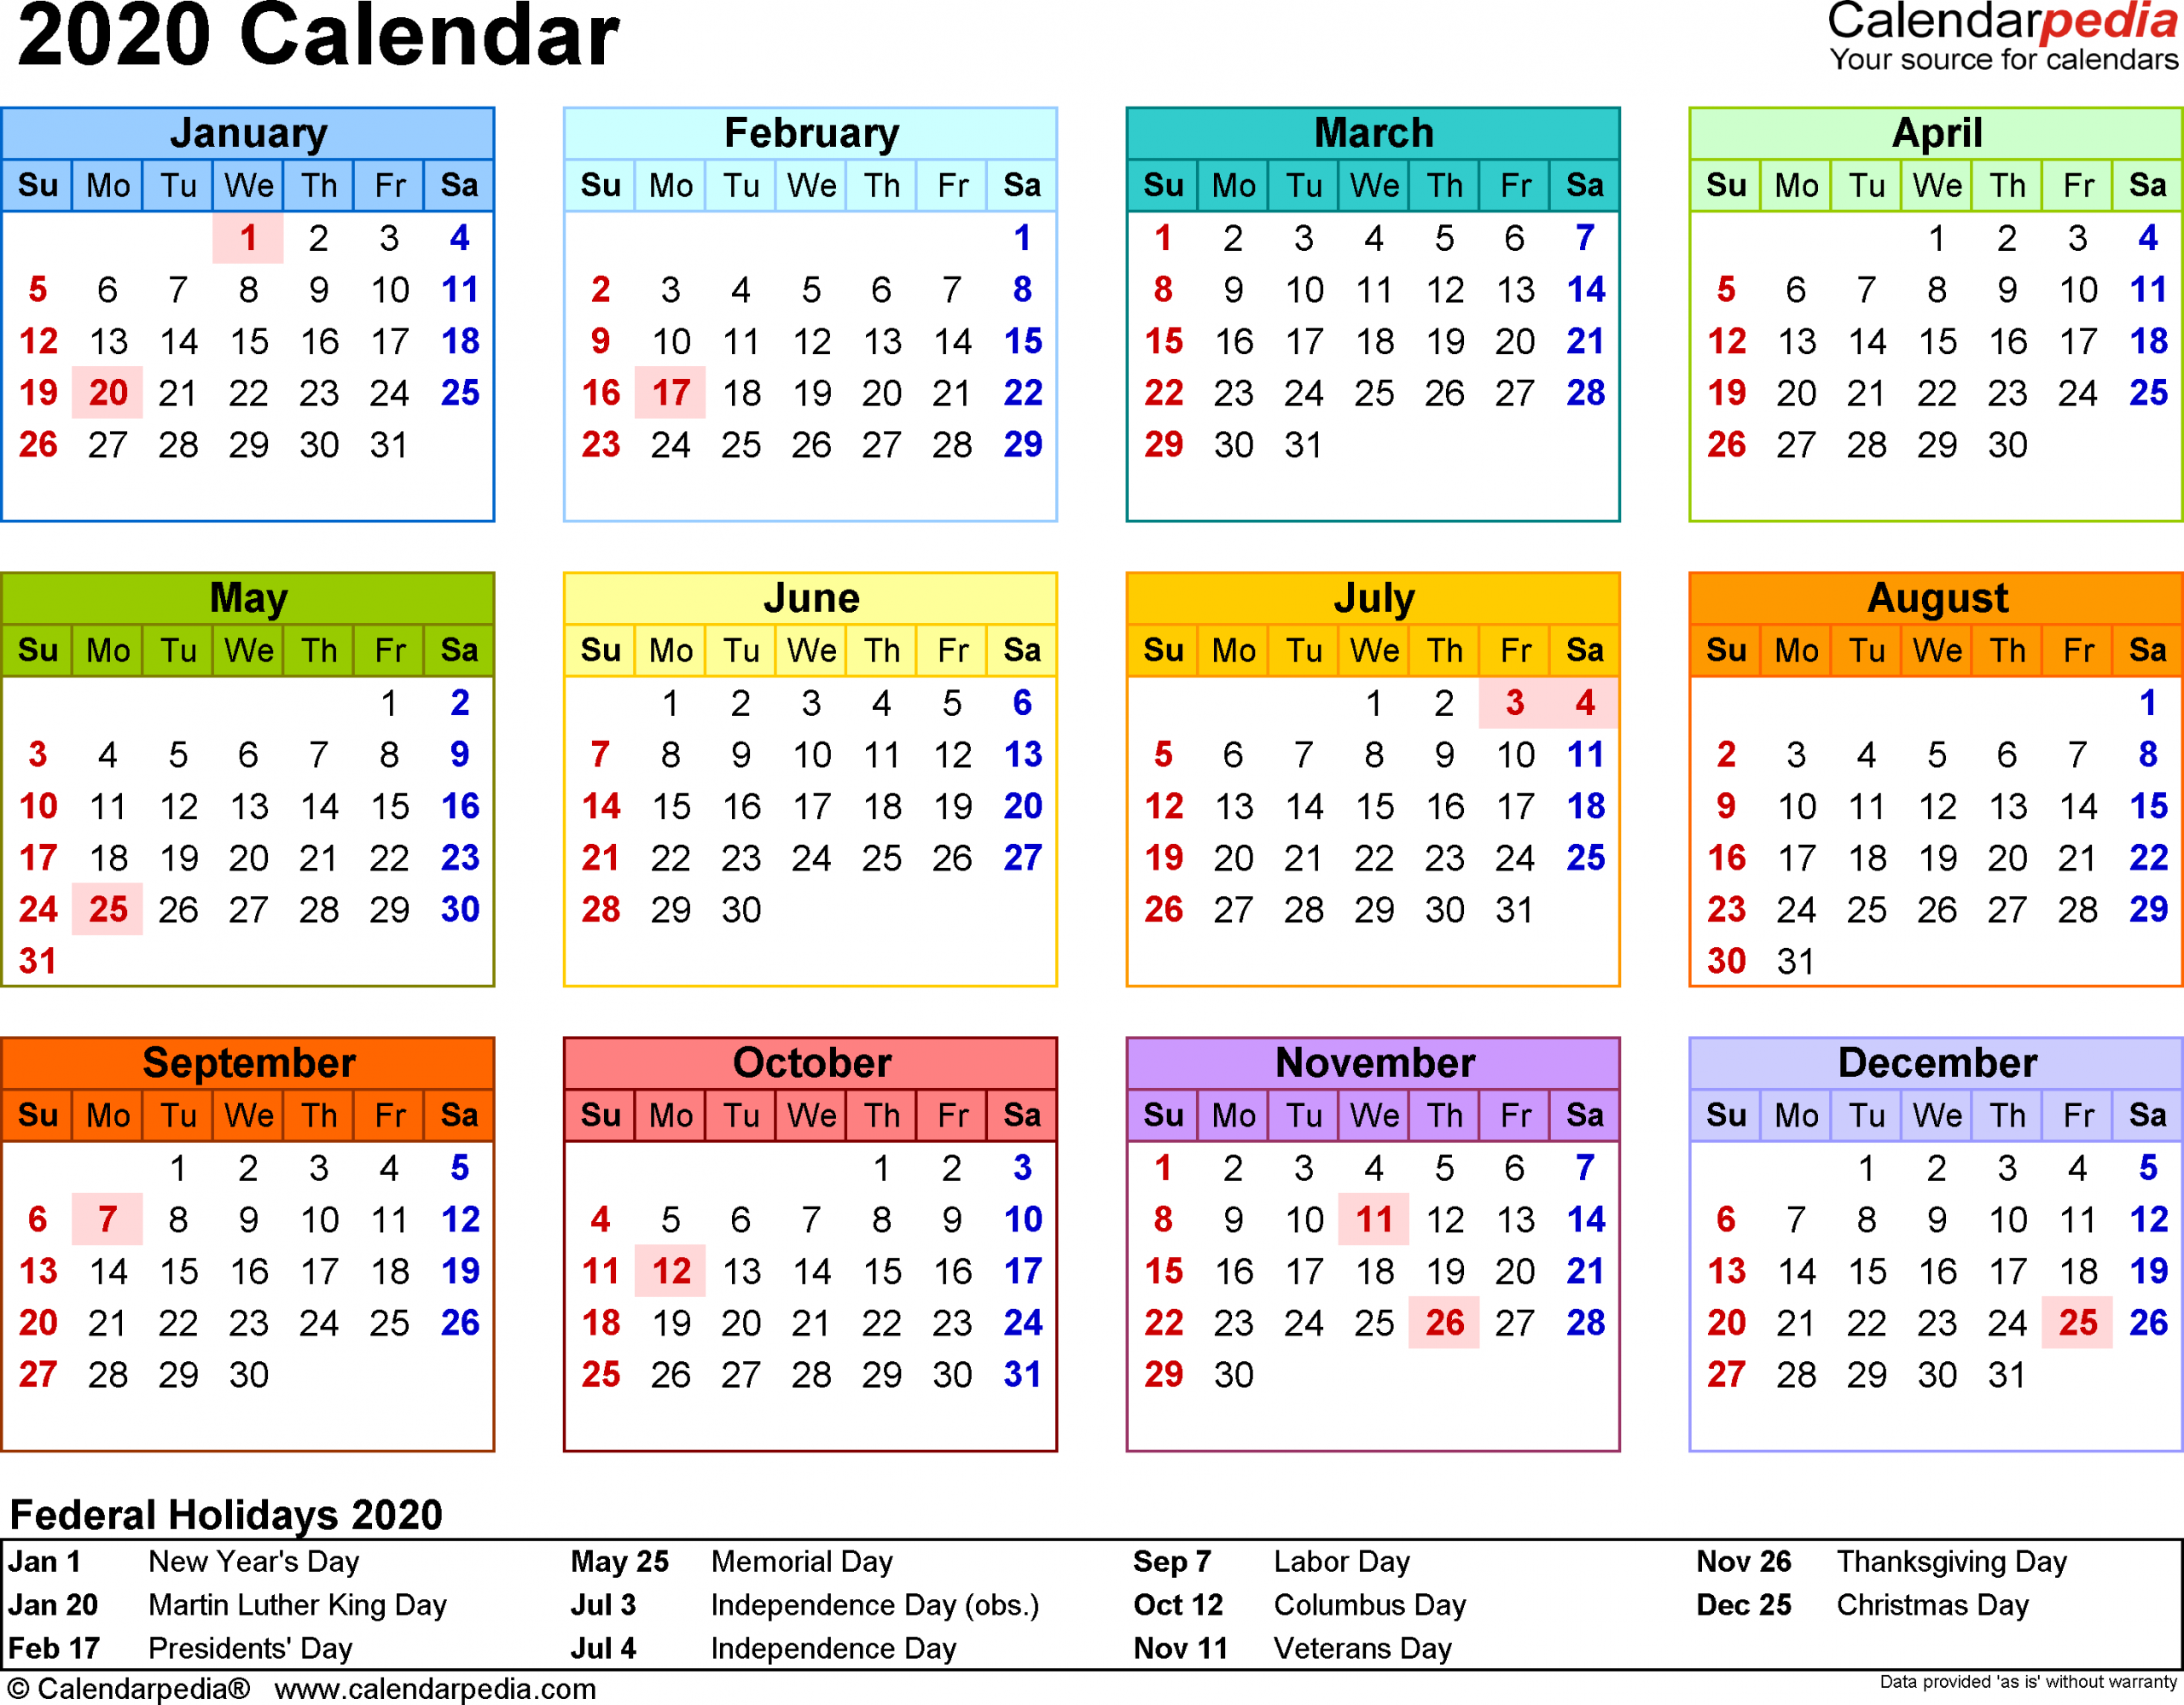 2020 Calendar Print Out - Togo.wpart.co